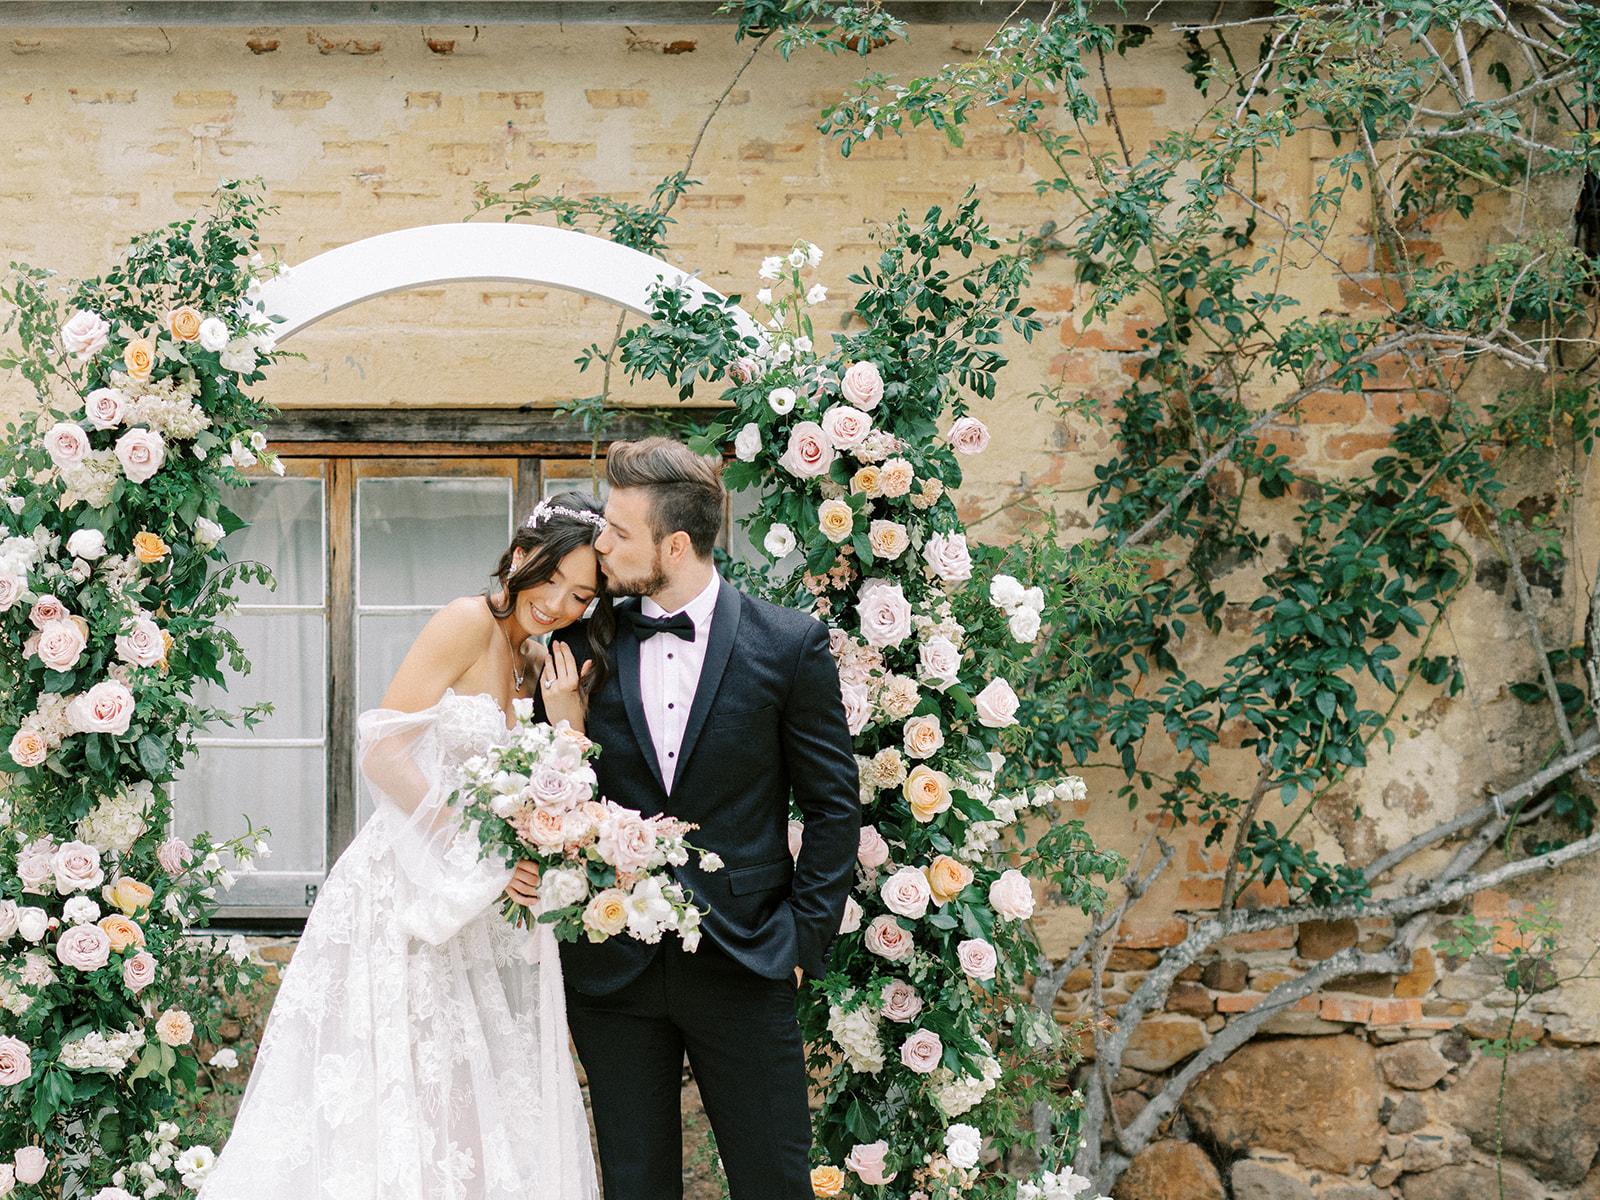 photography by lauren olivia at deaux belettes byron bay bridal wedding gowns dresses florals venue cake